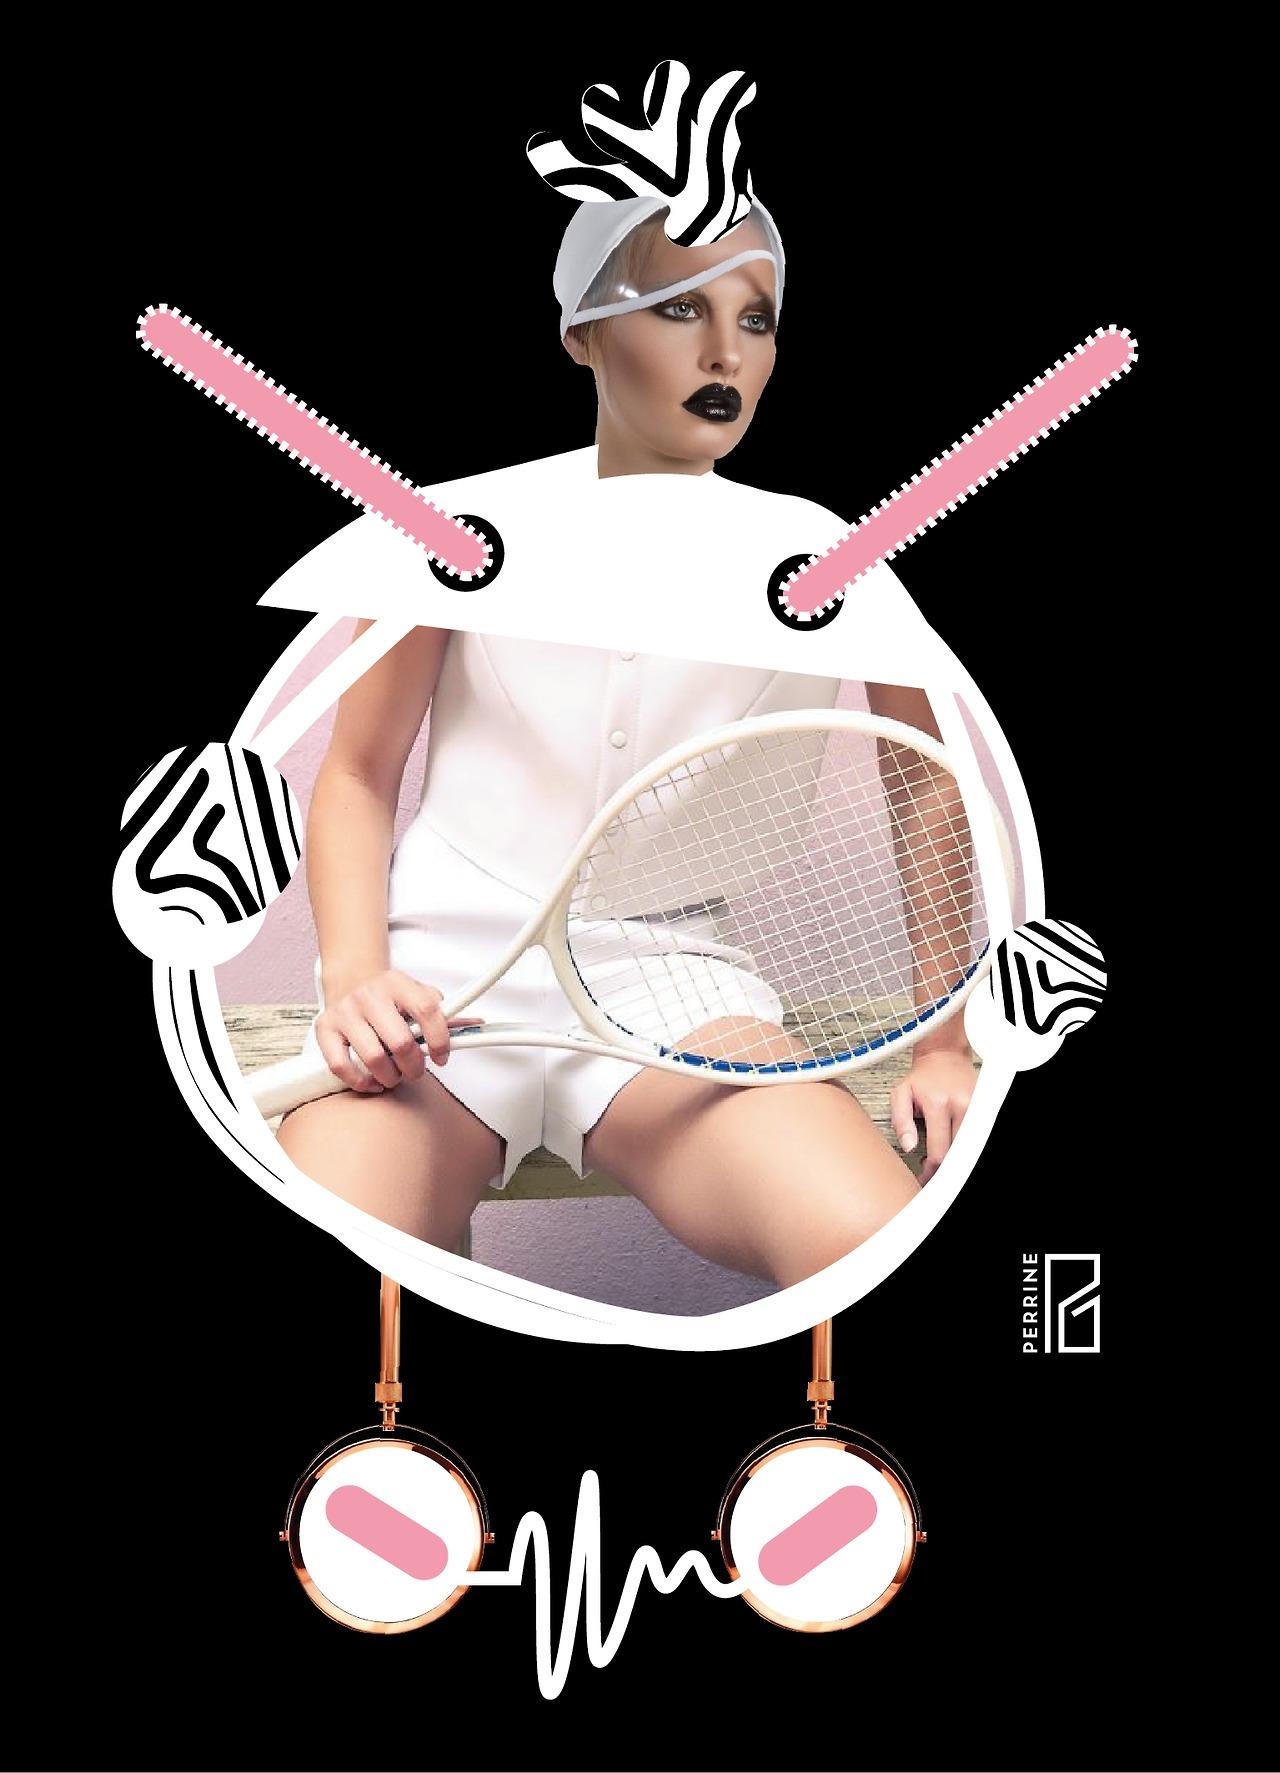 MARINE HENRION ® | Site Officiel | Créatrice de mode futuriste Perrine Grégy